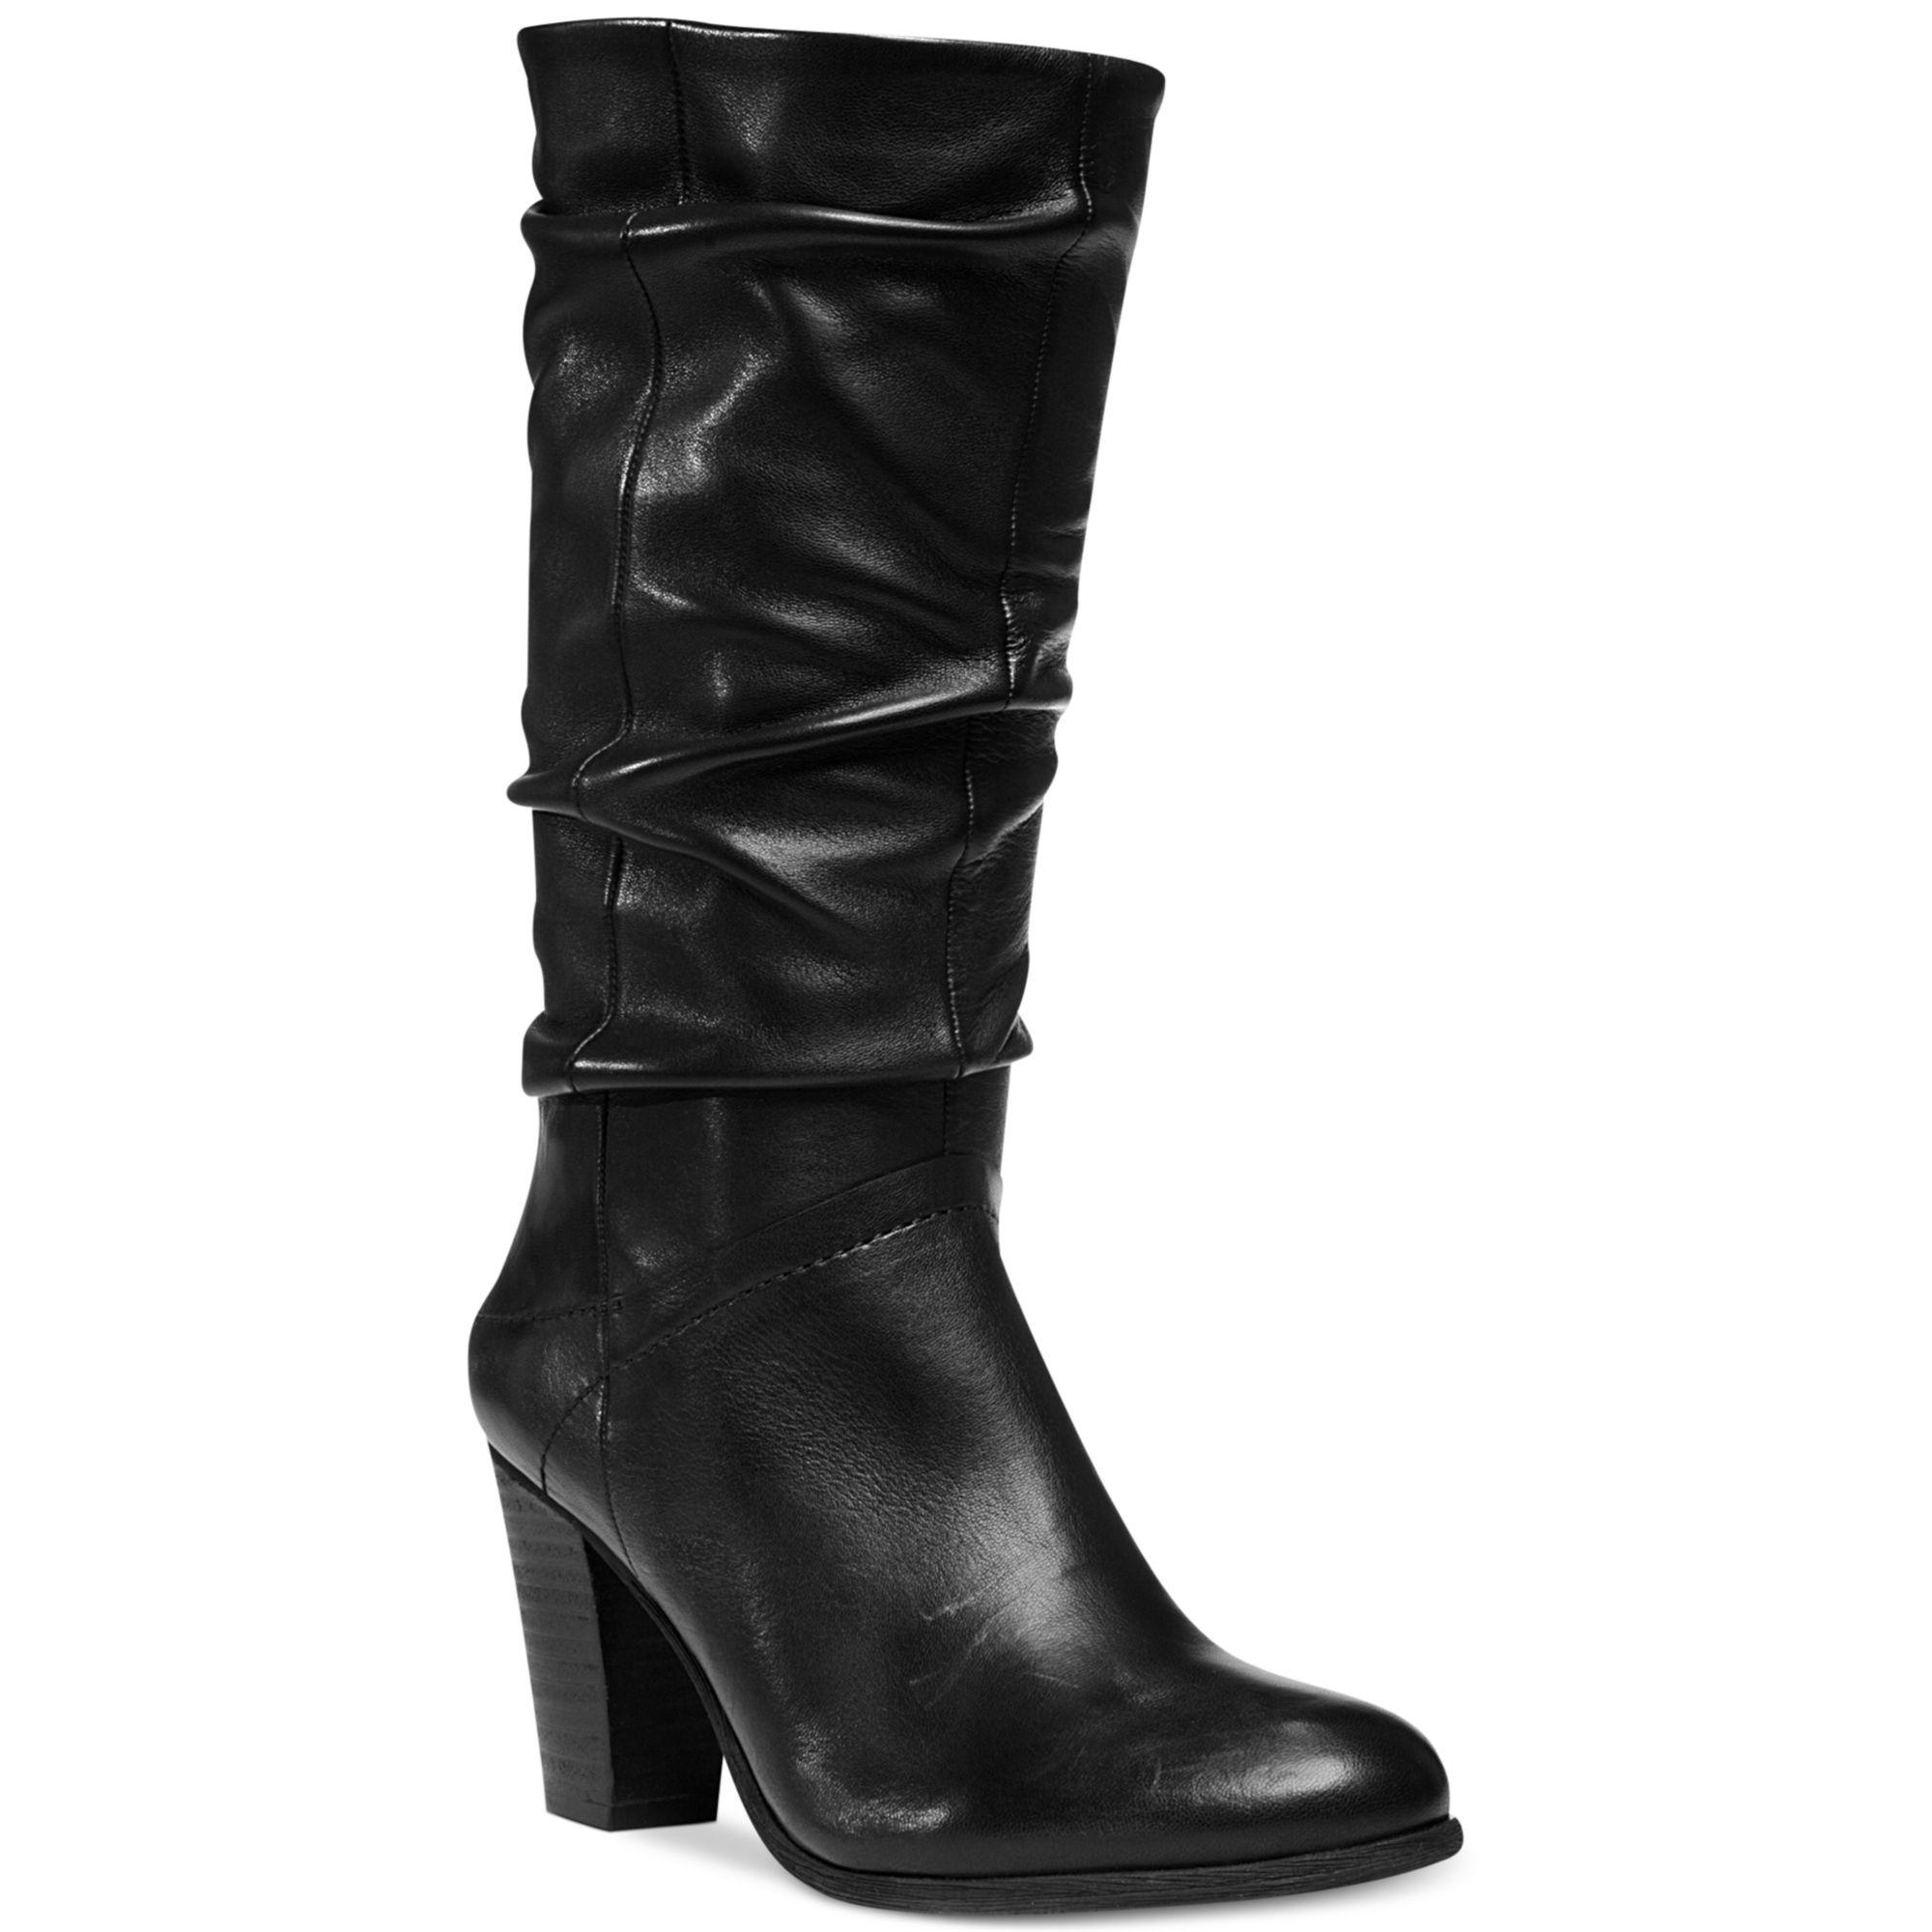 47f278183d4 Lyst - Steve Madden Womens Loretta Slouch Boots in Black